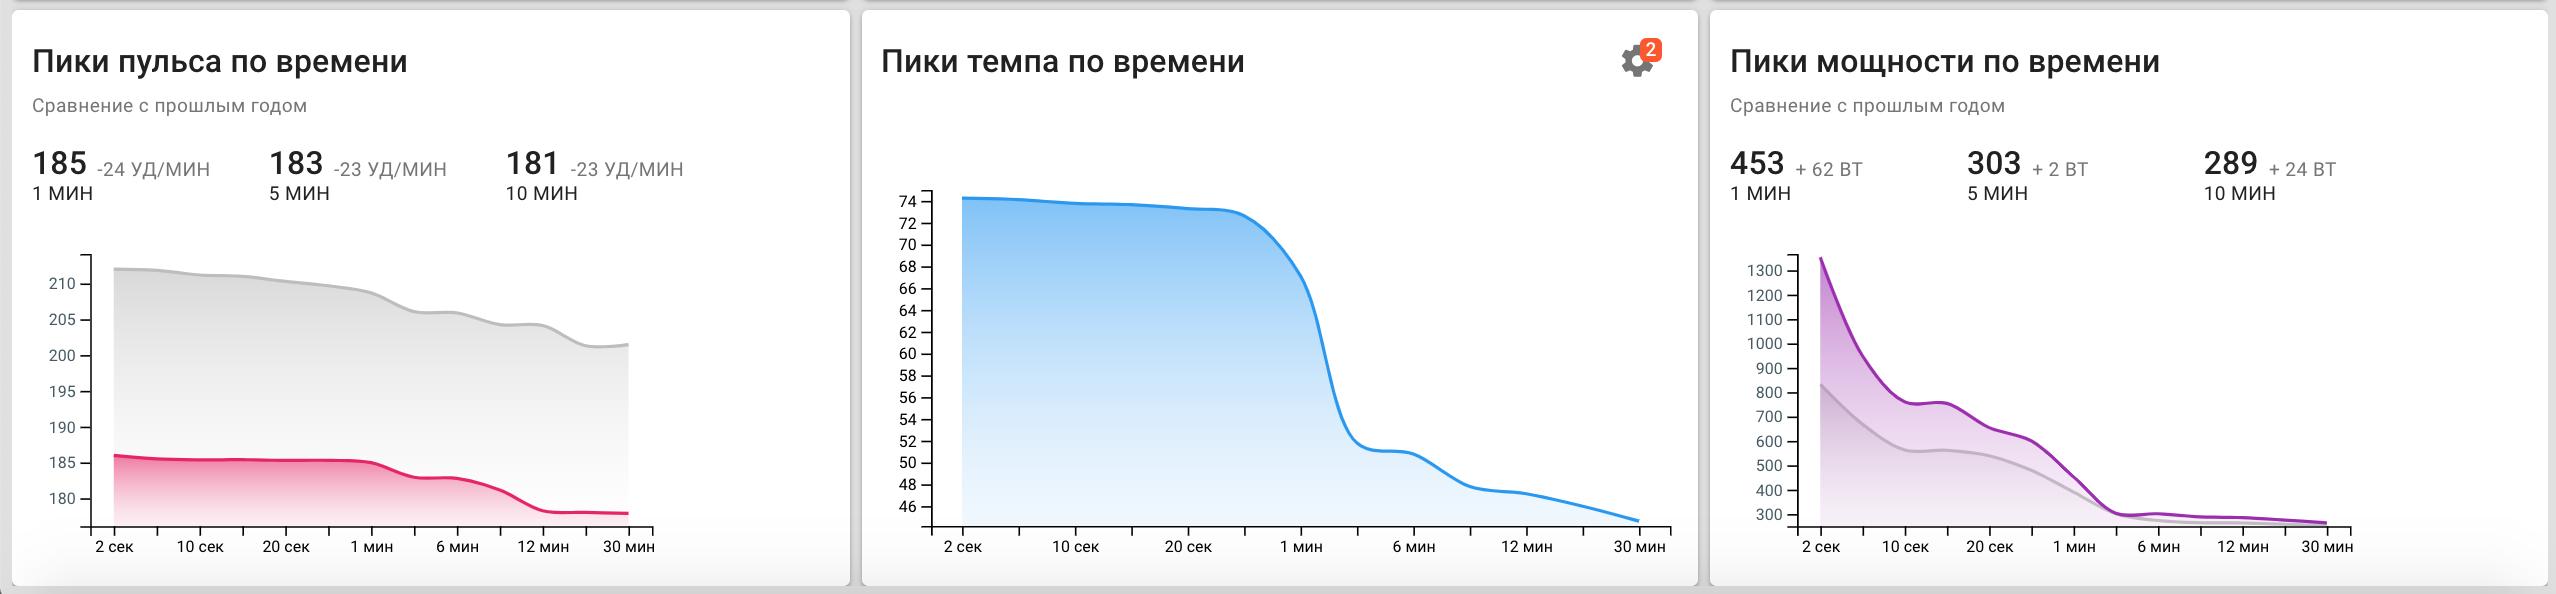 reports-peaks